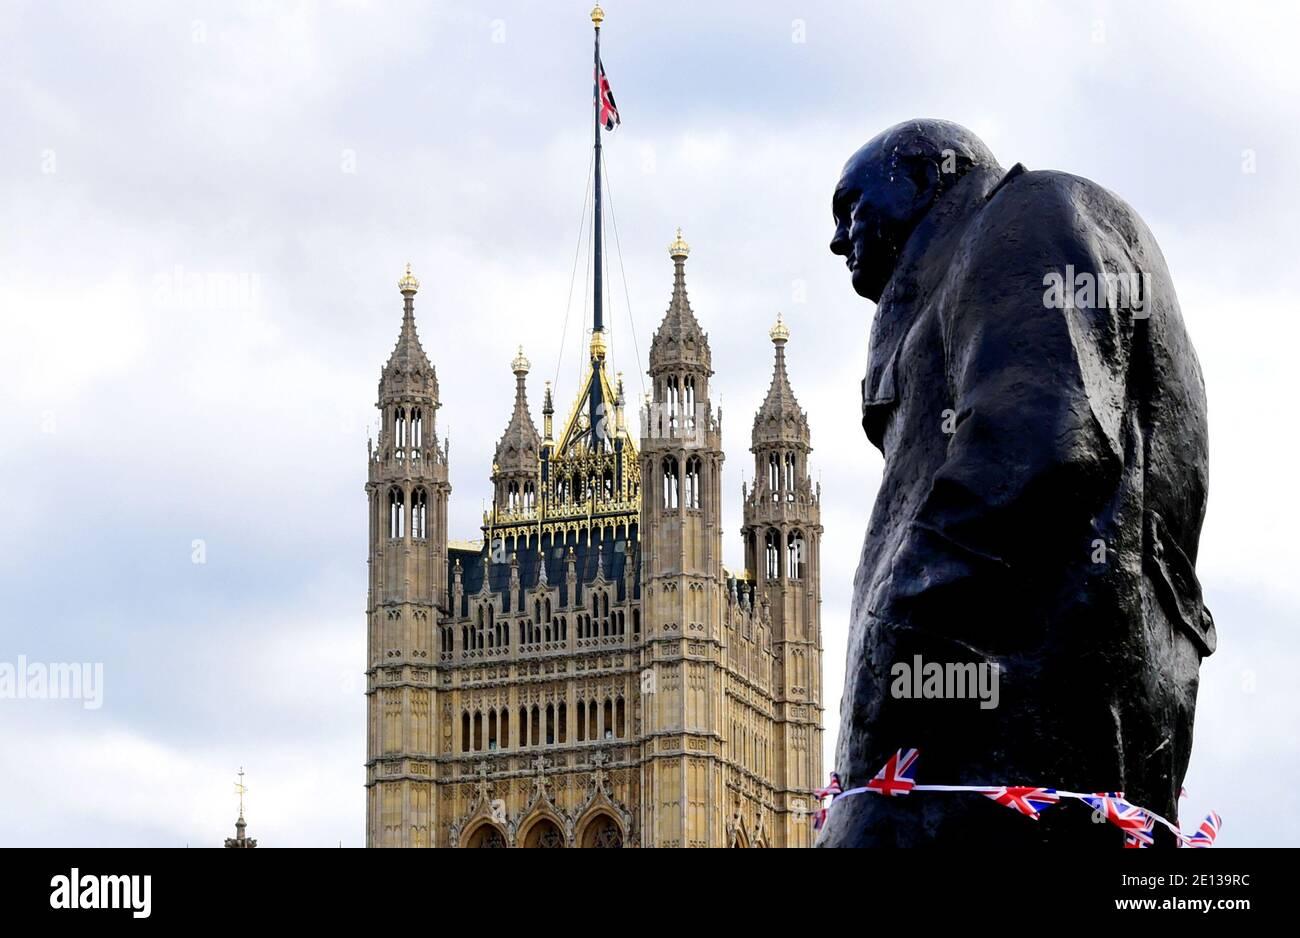 London, Großbritannien. September 2019. Ein Denkmal von Winston Churchill, dem ehemaligen Premierminister von Großbritannien, vor dem Victoria Tower des Westminster Palace. Quelle: Waltraud Grubitzsch/dpa-Zentralbild/ZB/dpa/Alamy Live News Stockfoto